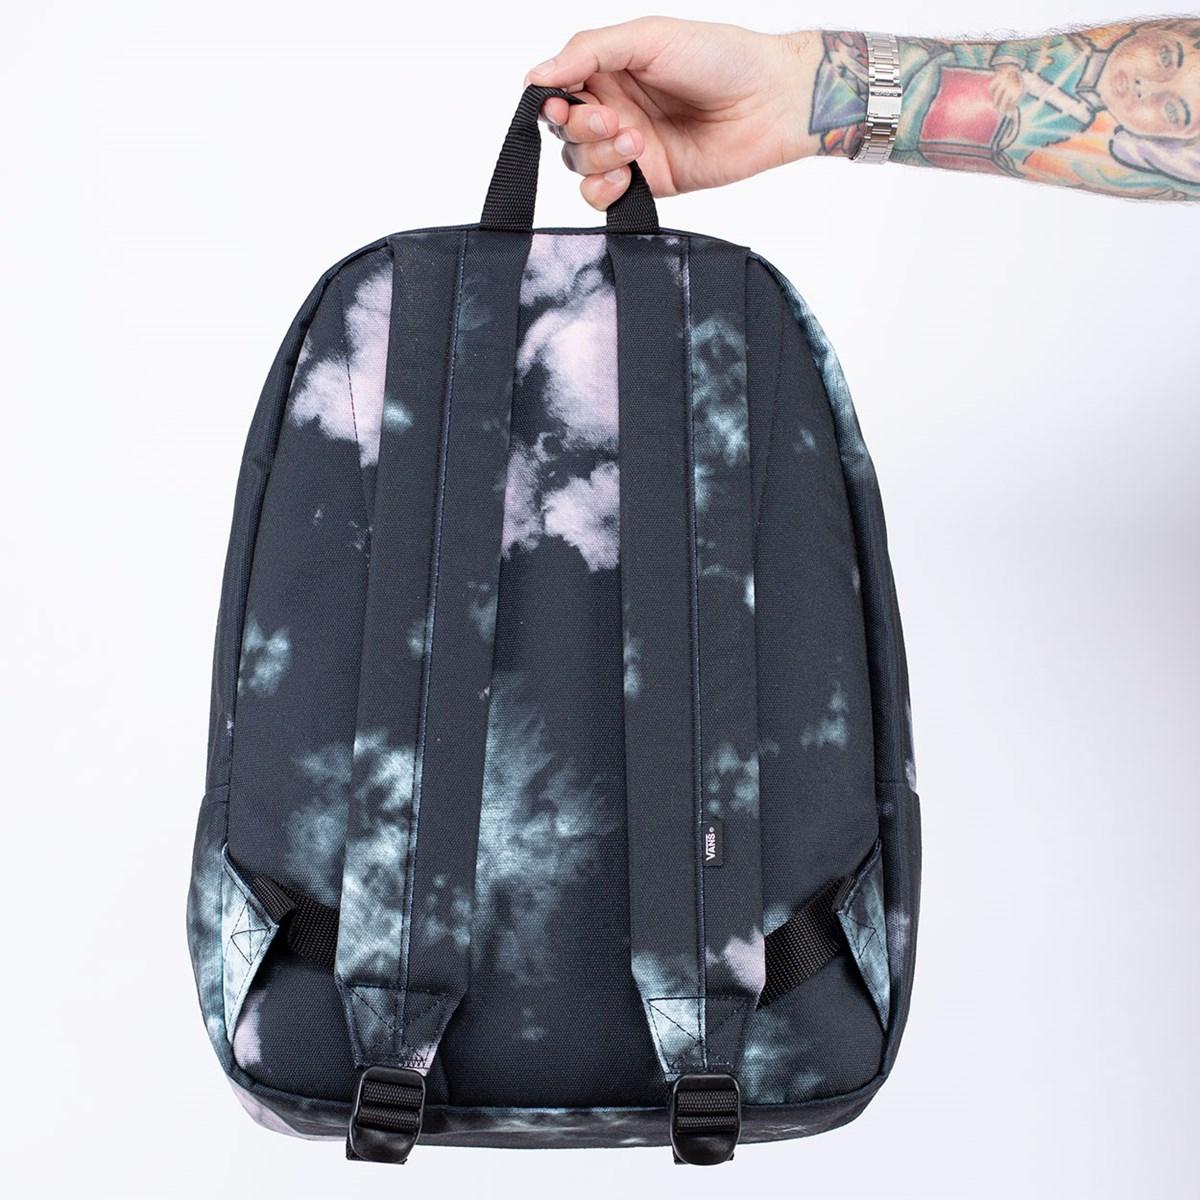 Mochila Vans Old Skool III Backpack Black Tie Dye VN0A3I6RBZX